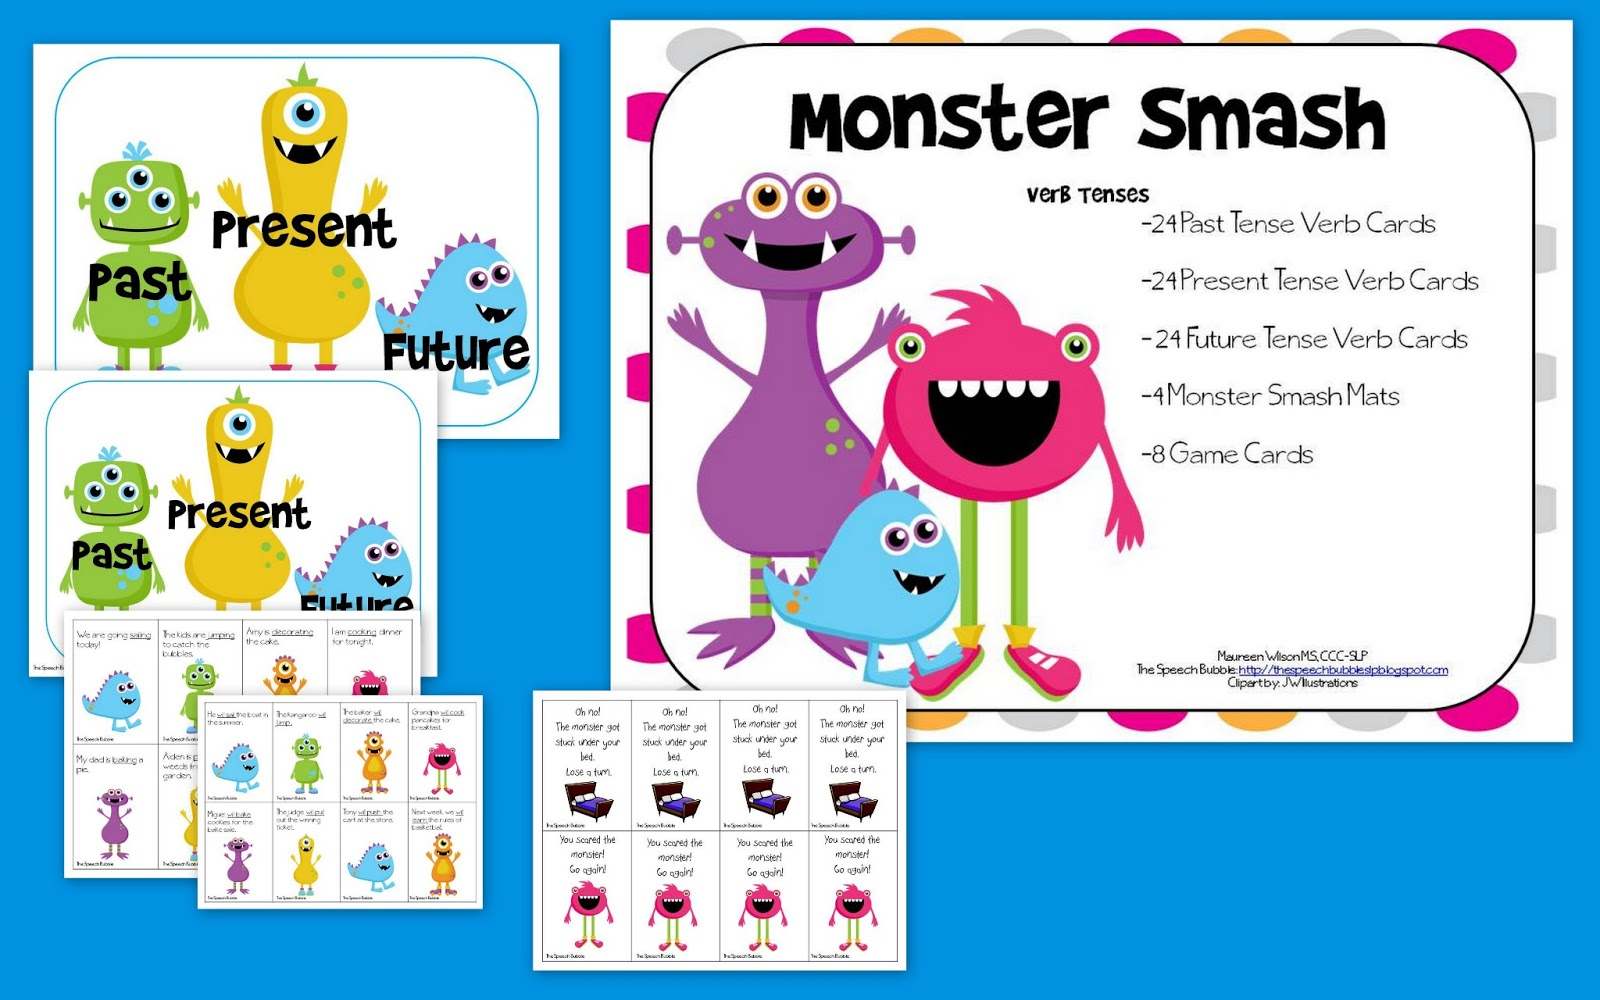 Monster Smash: Verb Tenses - The Speech Bubble